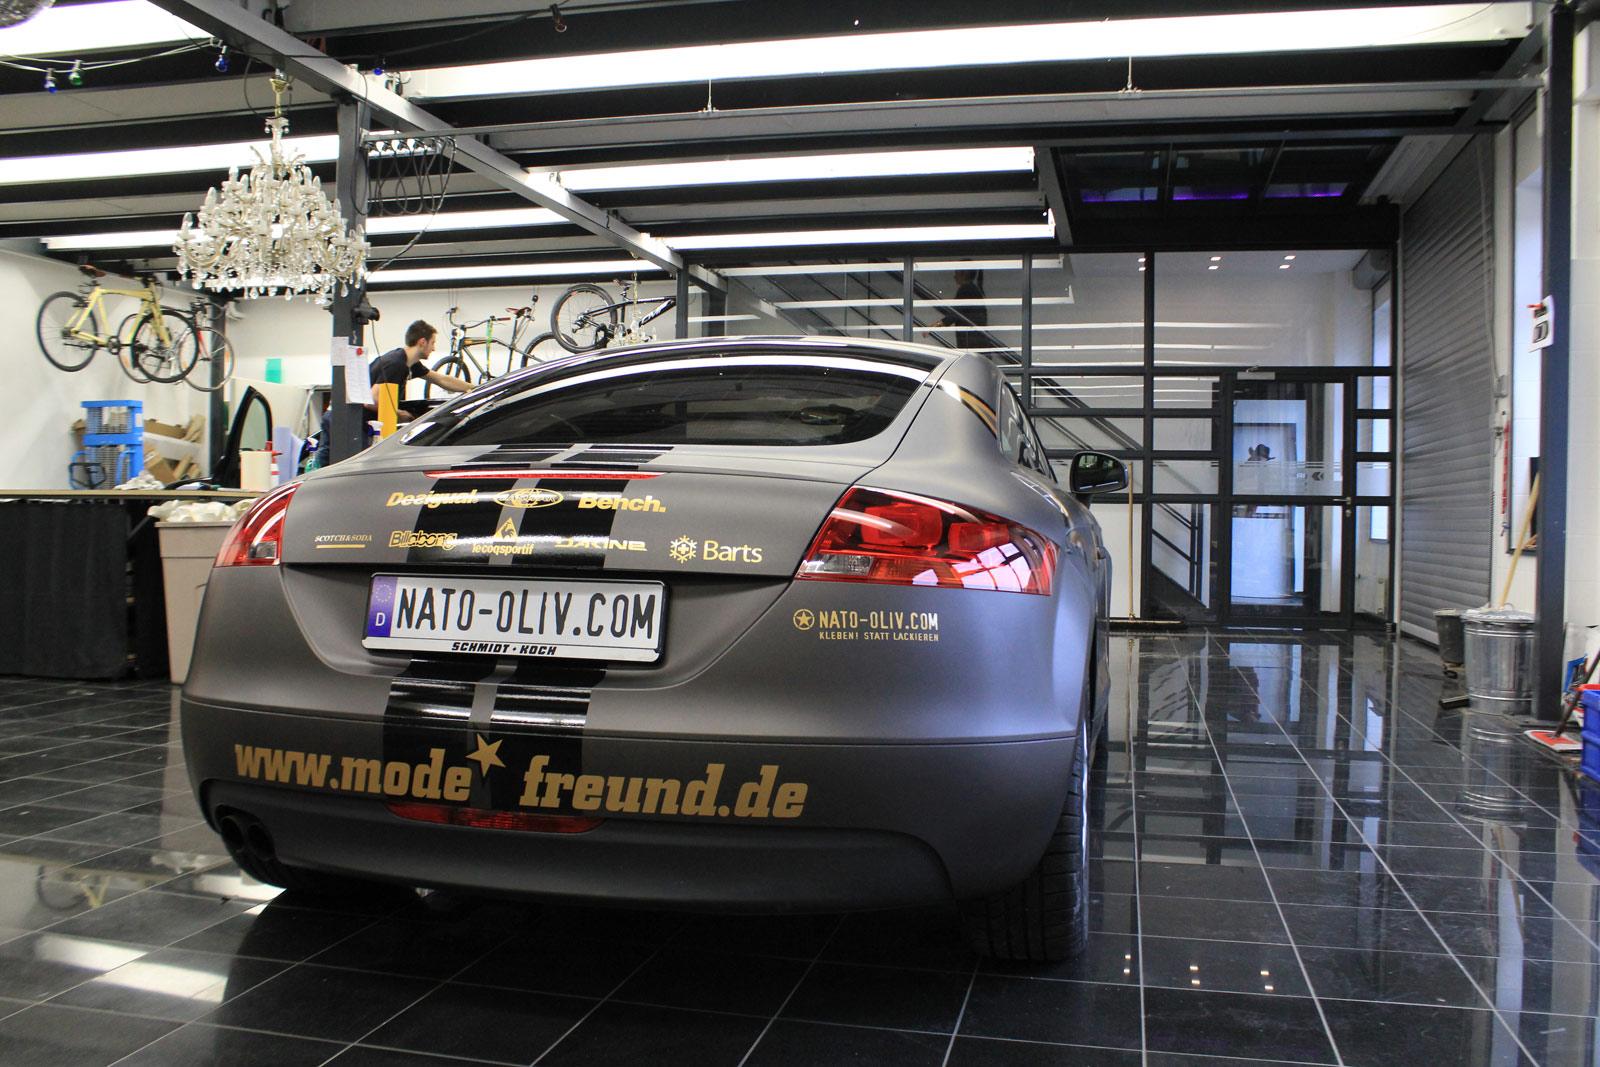 Audi_TT_Braun_Matt_Metallic_Branding_66